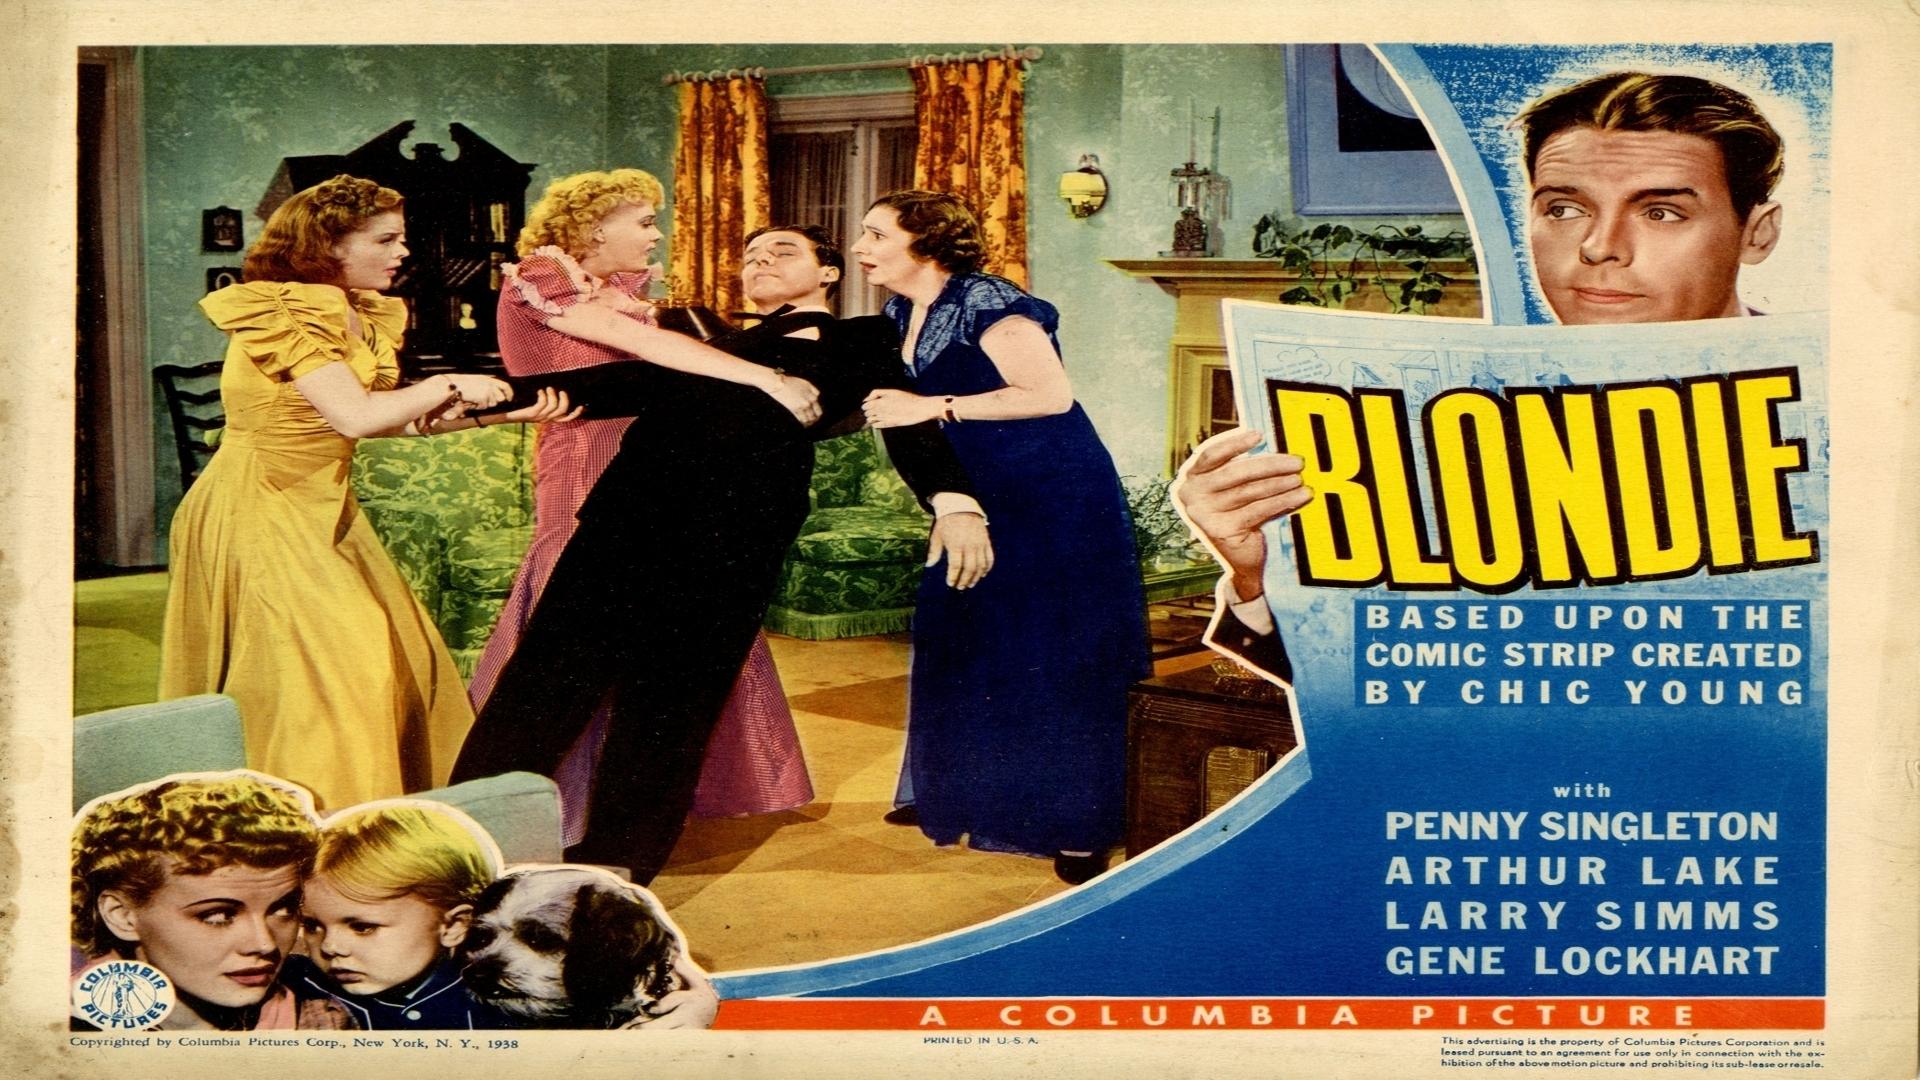 blondie 1938 k233pek mafabhu